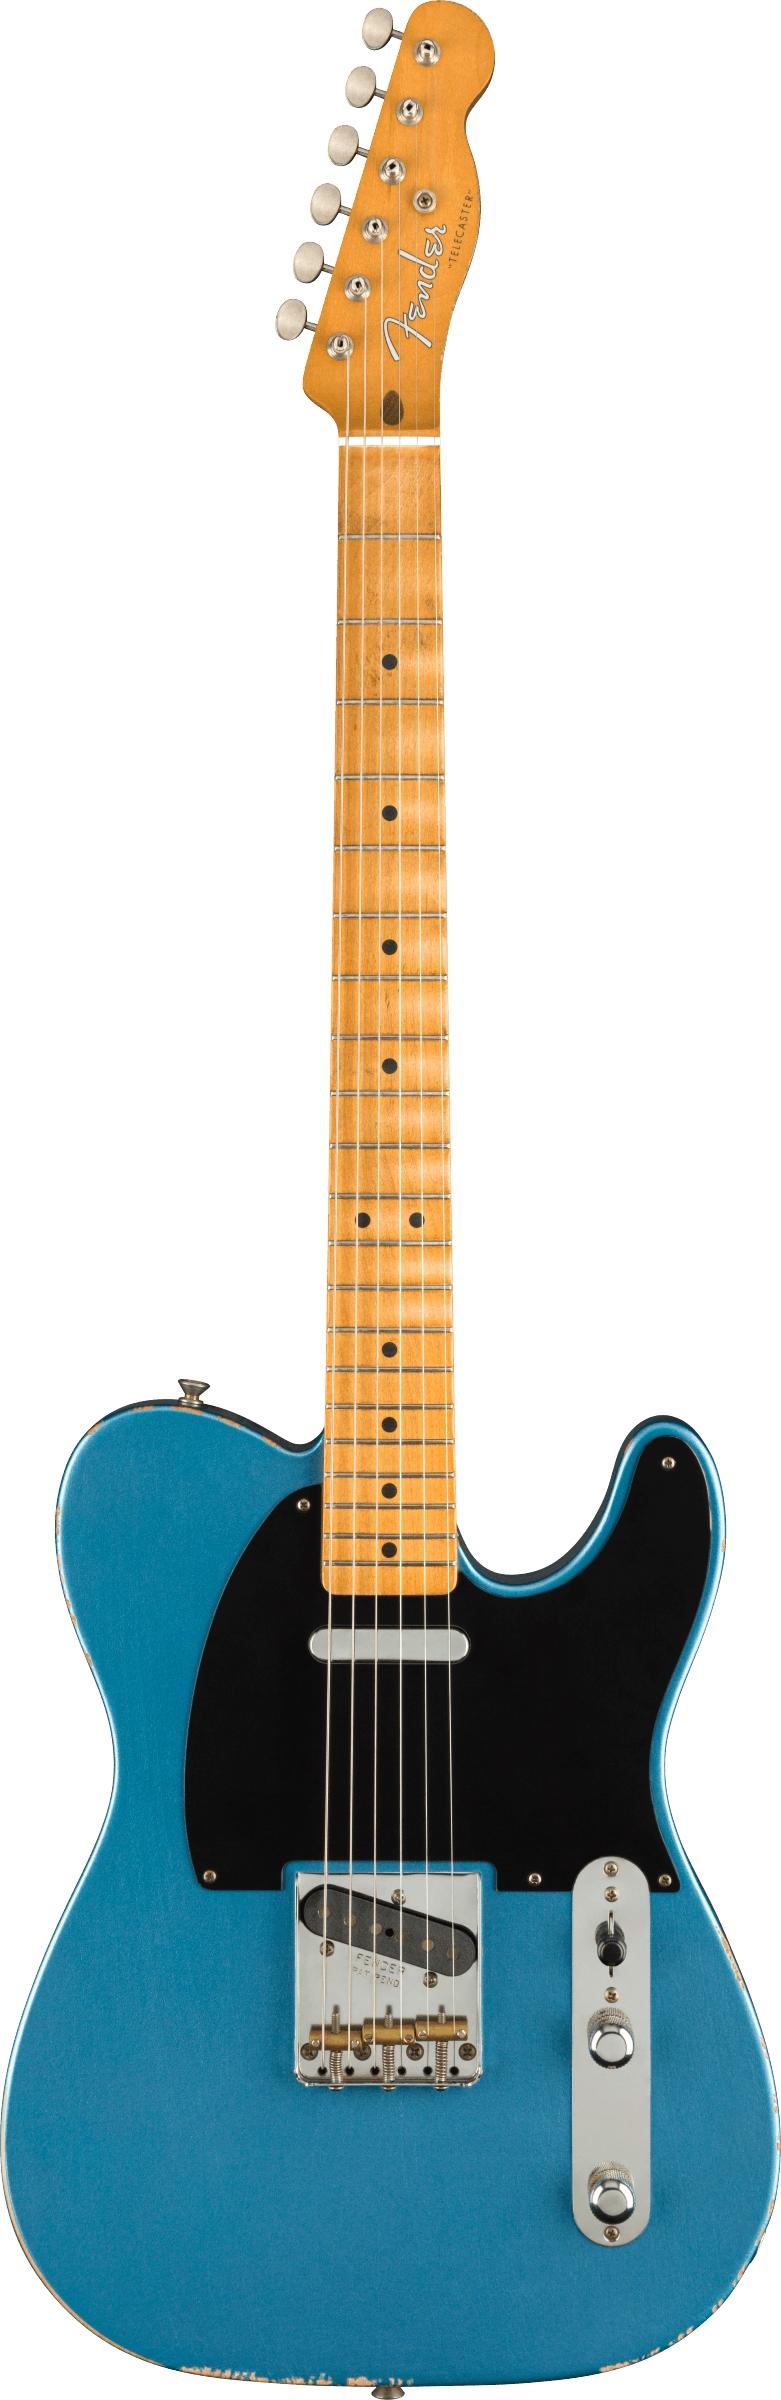 Fender Vintera Road Worn® '50s Telecaster®, Maple Fingerboard, Lake Placid Blue